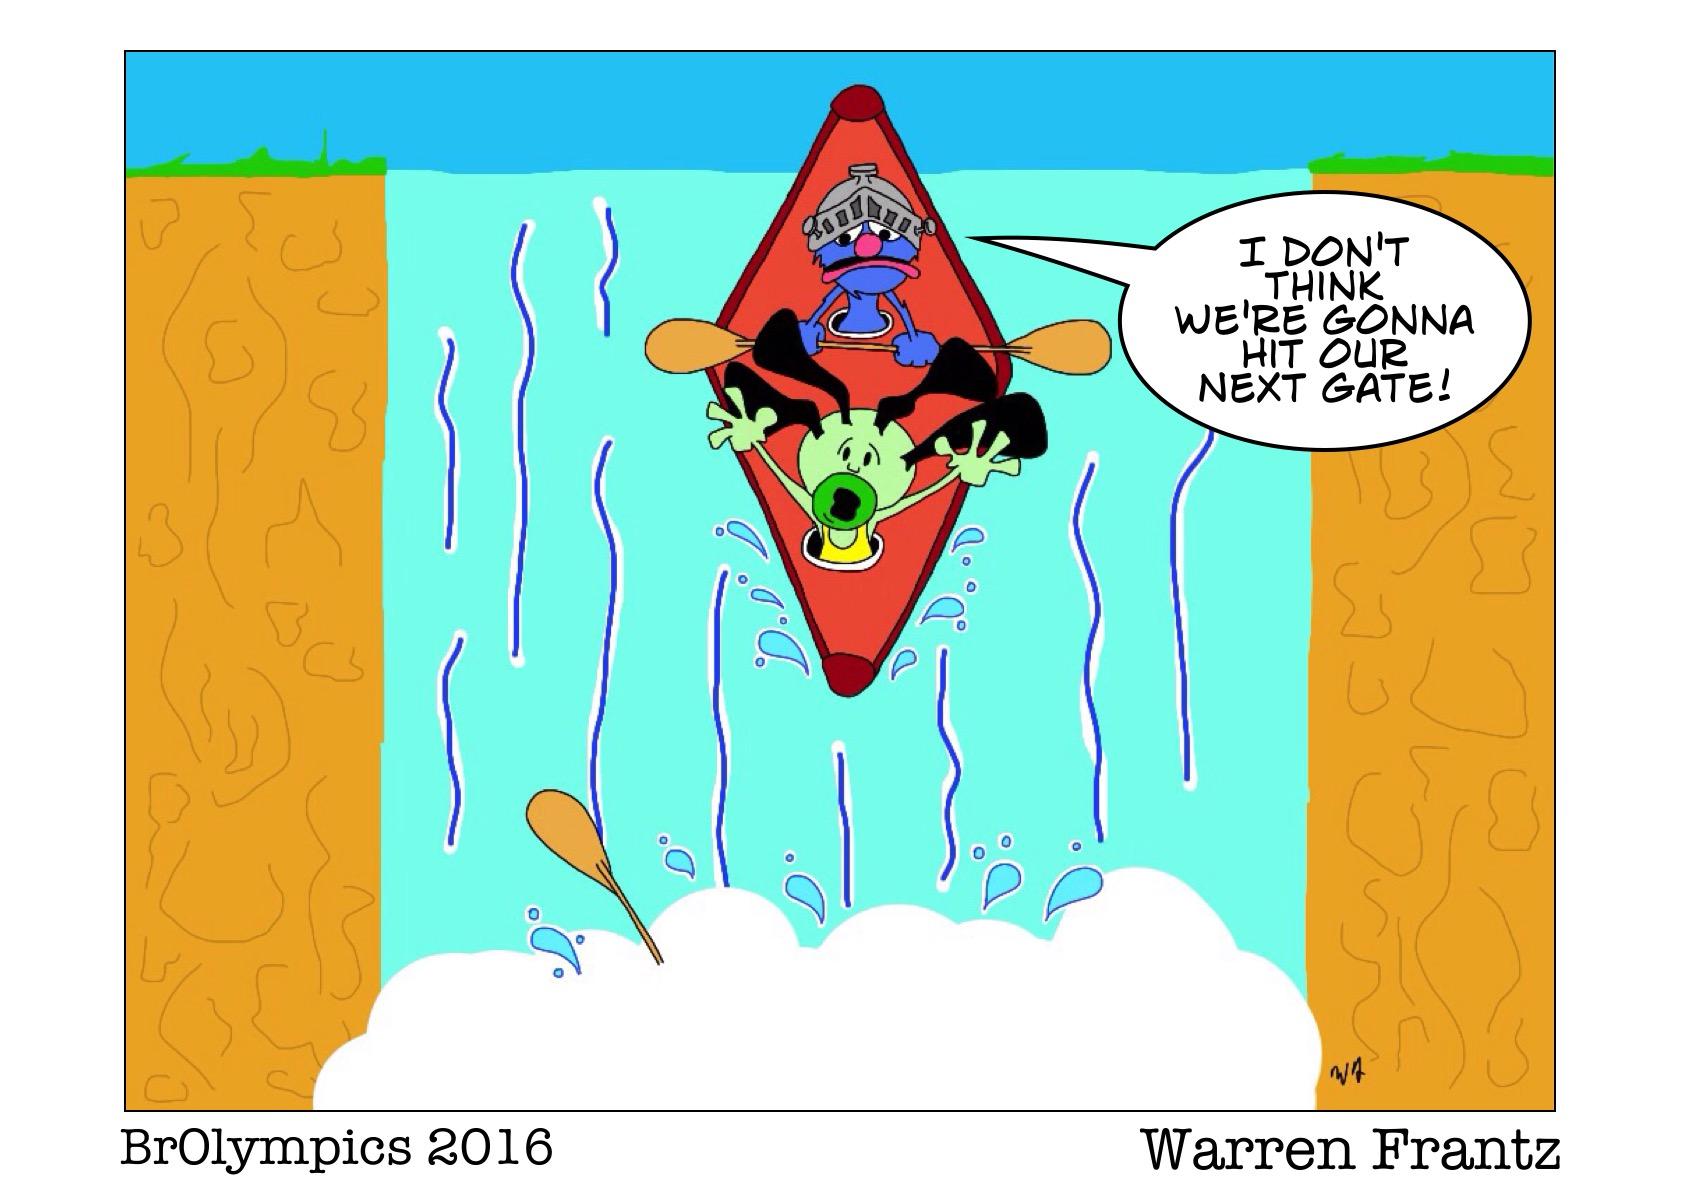 BrOlympics Kayaking